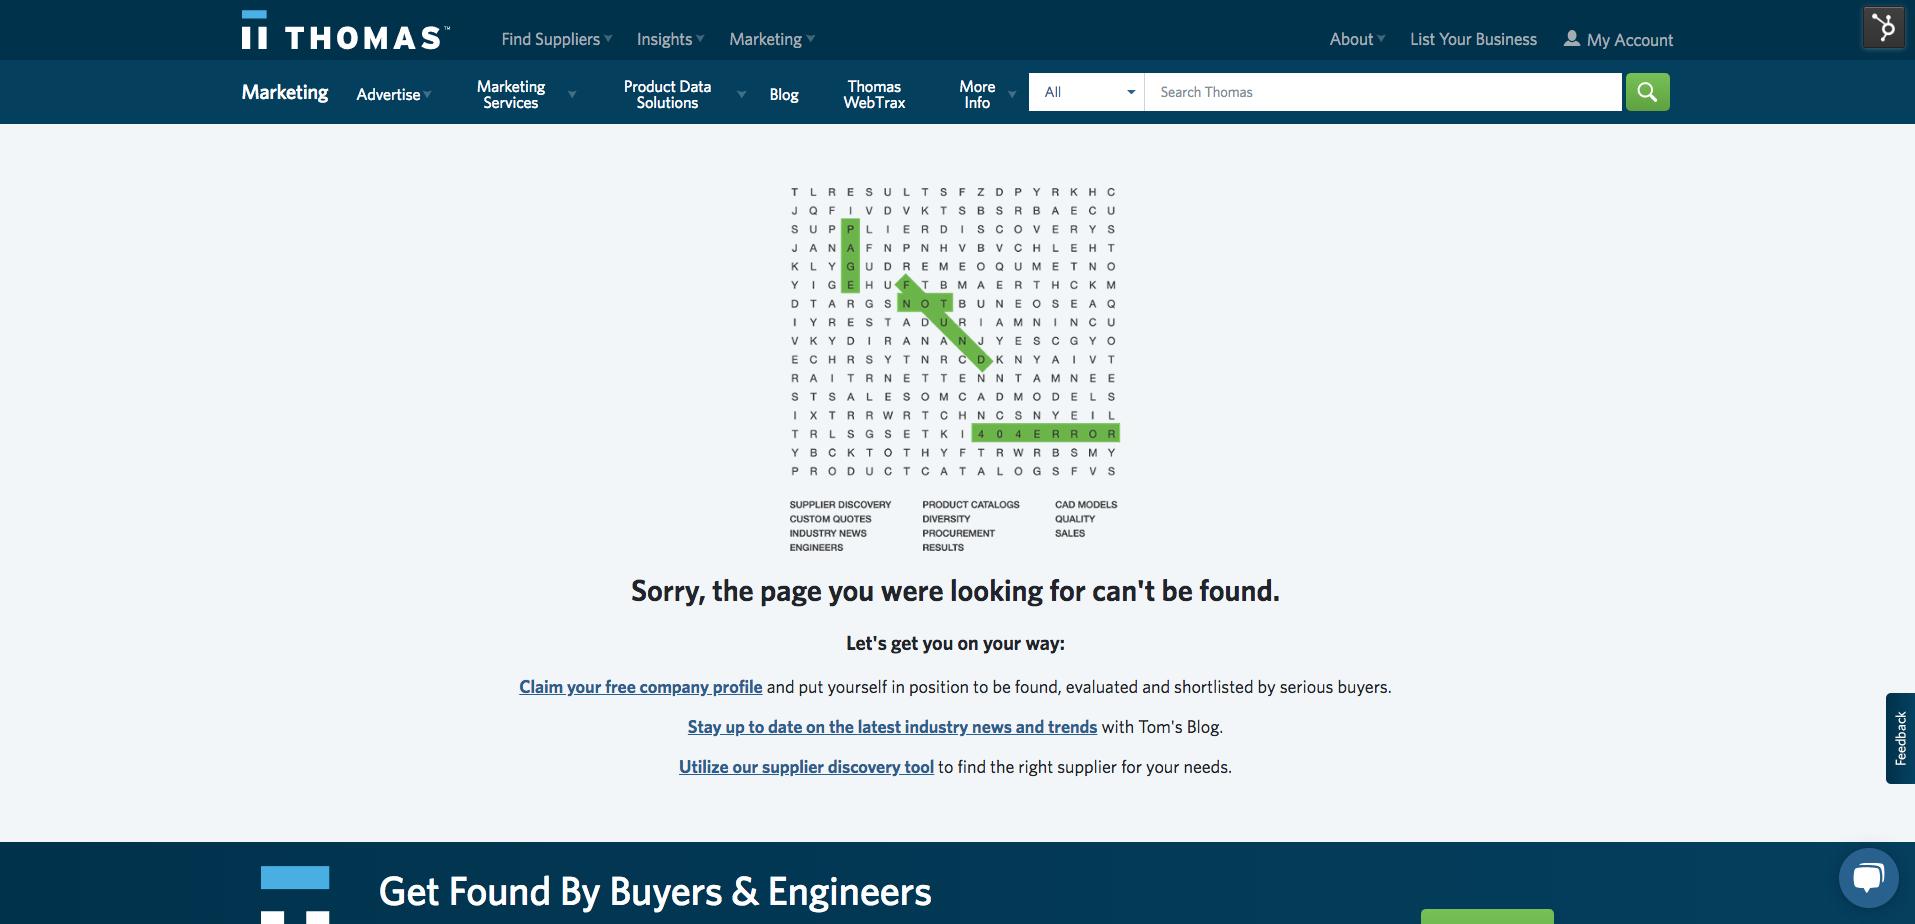 Thomas Network 404 Error